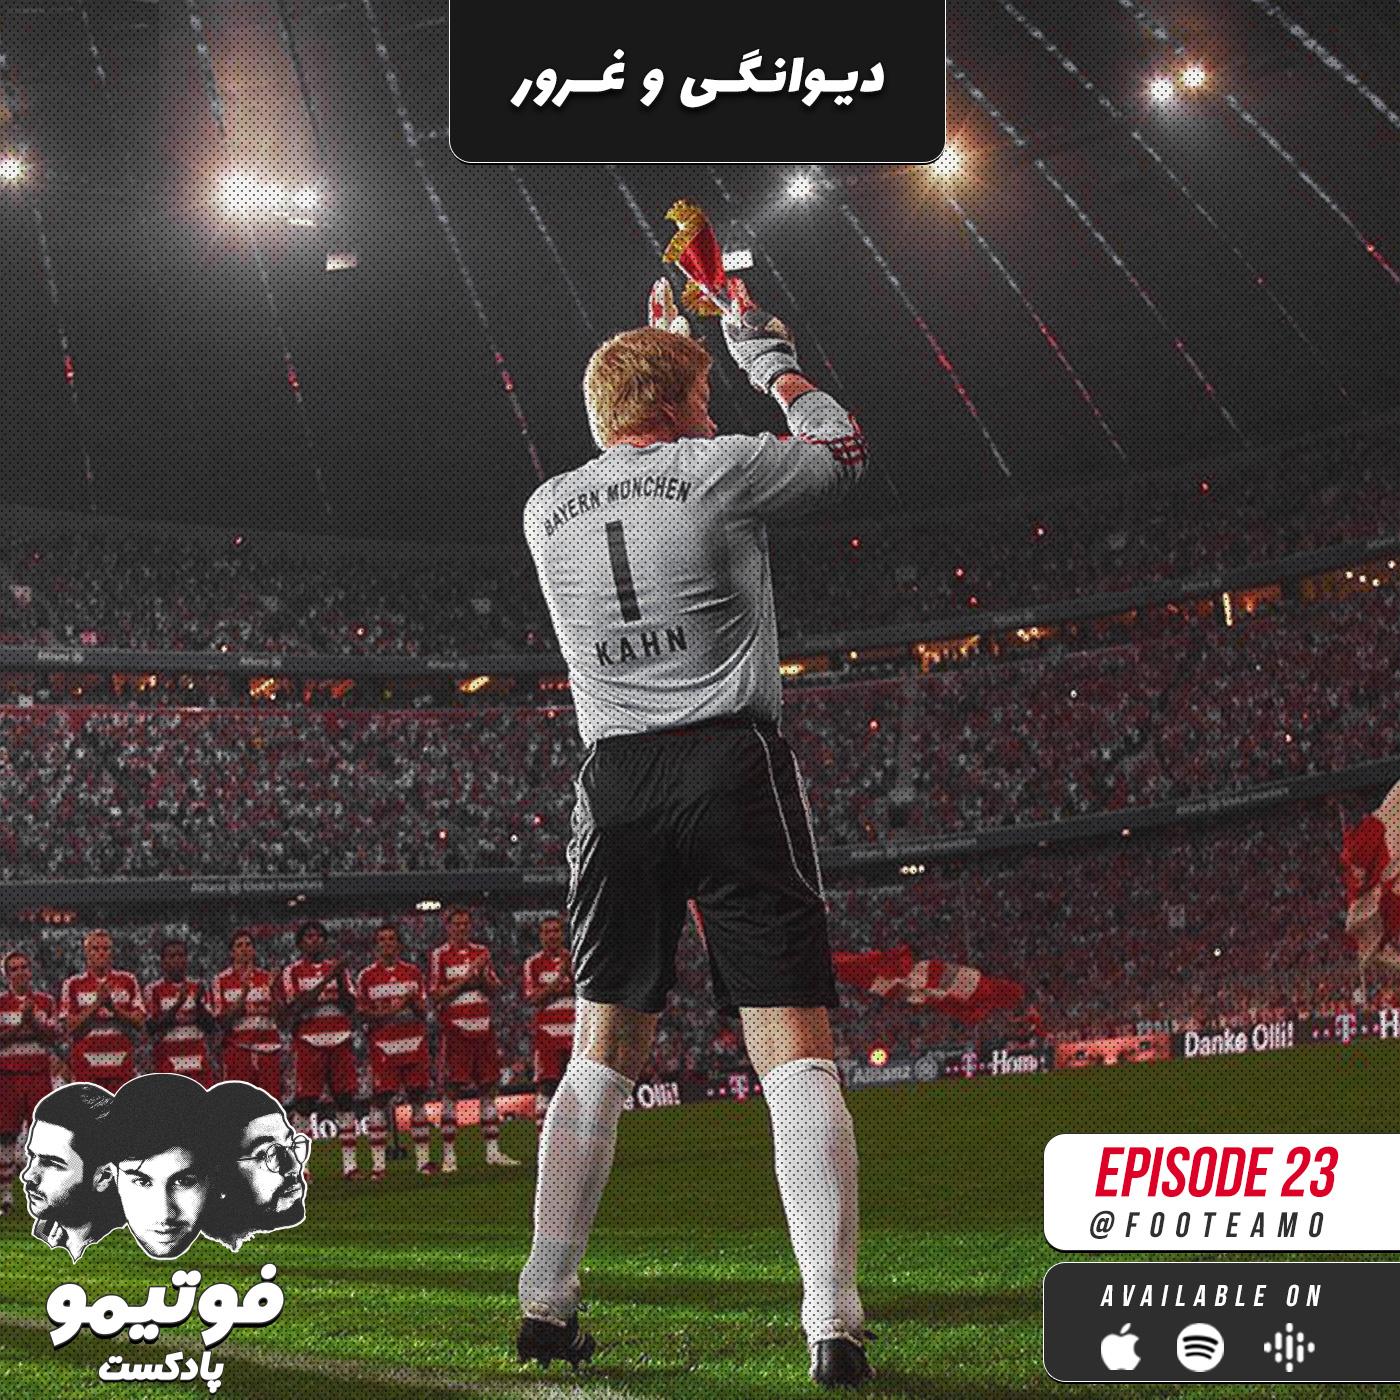 Poster Episode23 پادکست فوتبالی فوتیمو